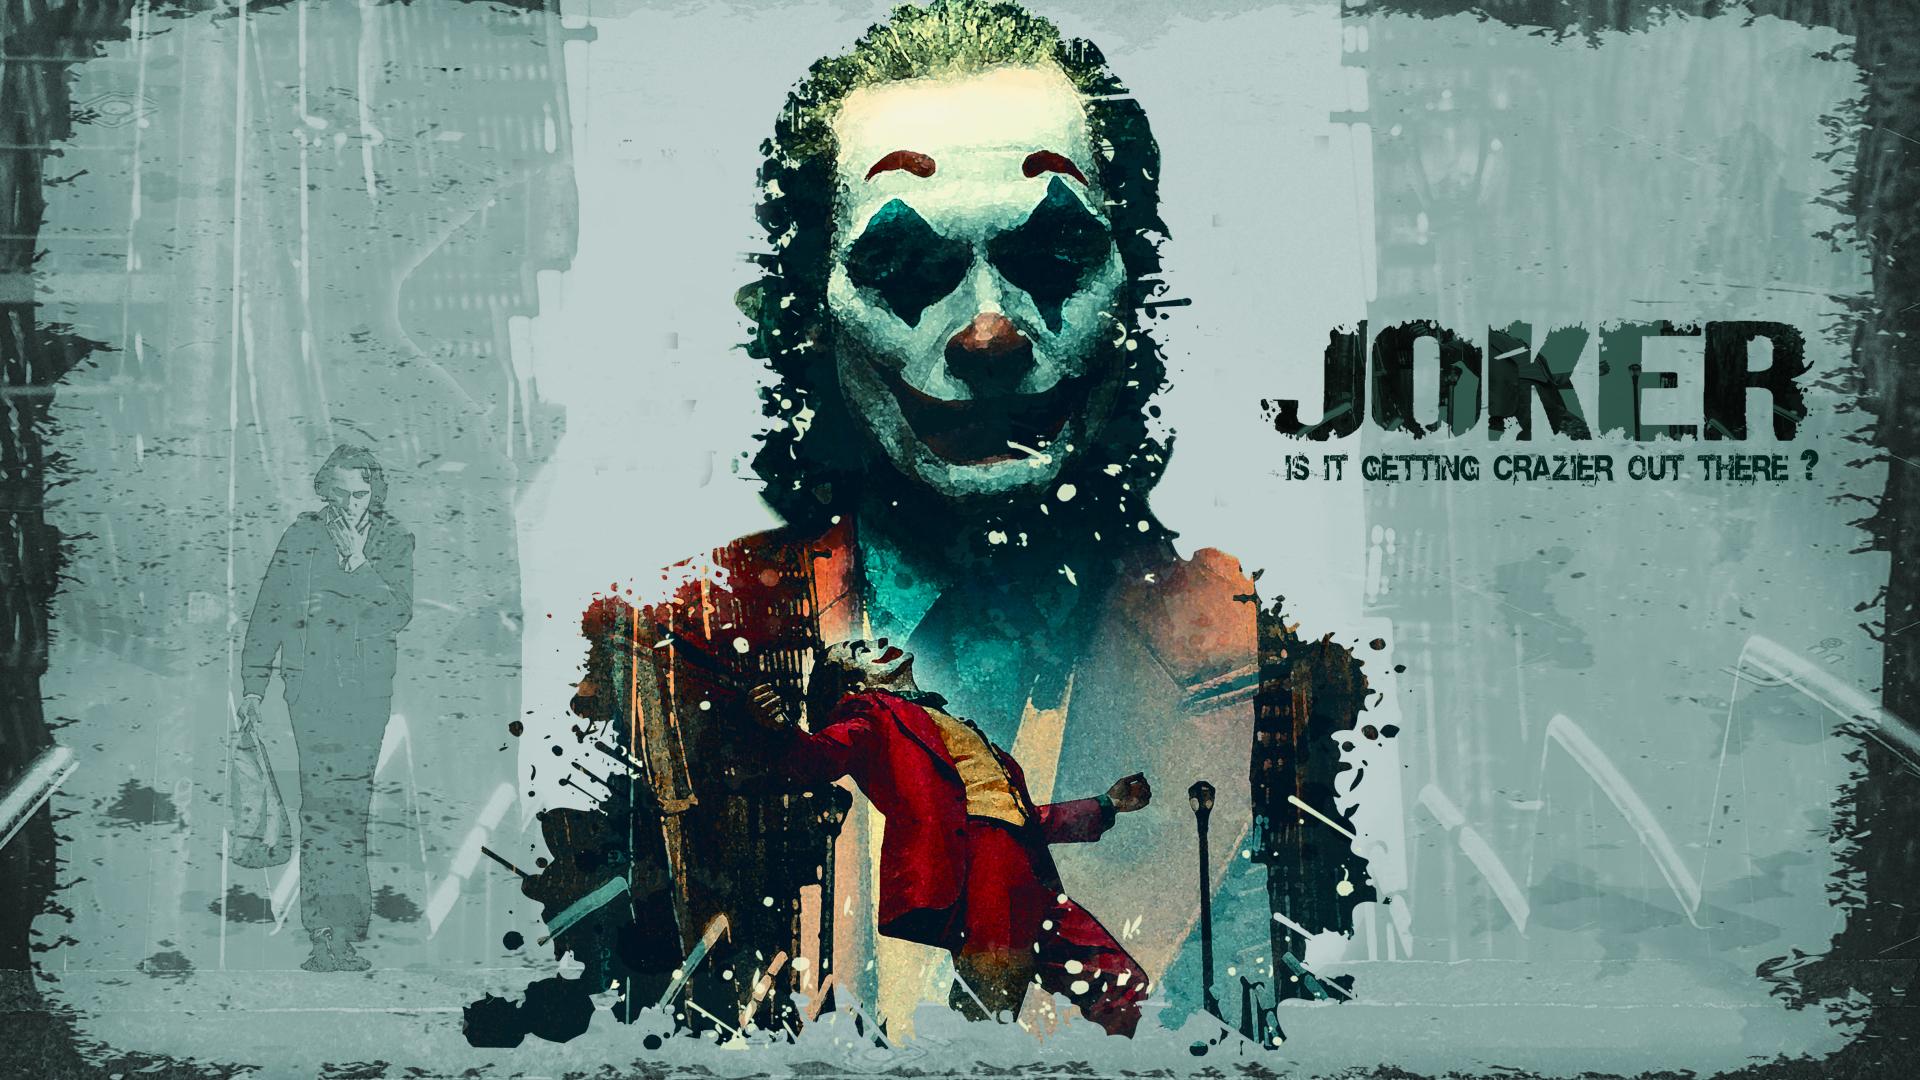 1920x1080 Joker 2019 Movie 1080P Laptop Full HD Wallpaper ...